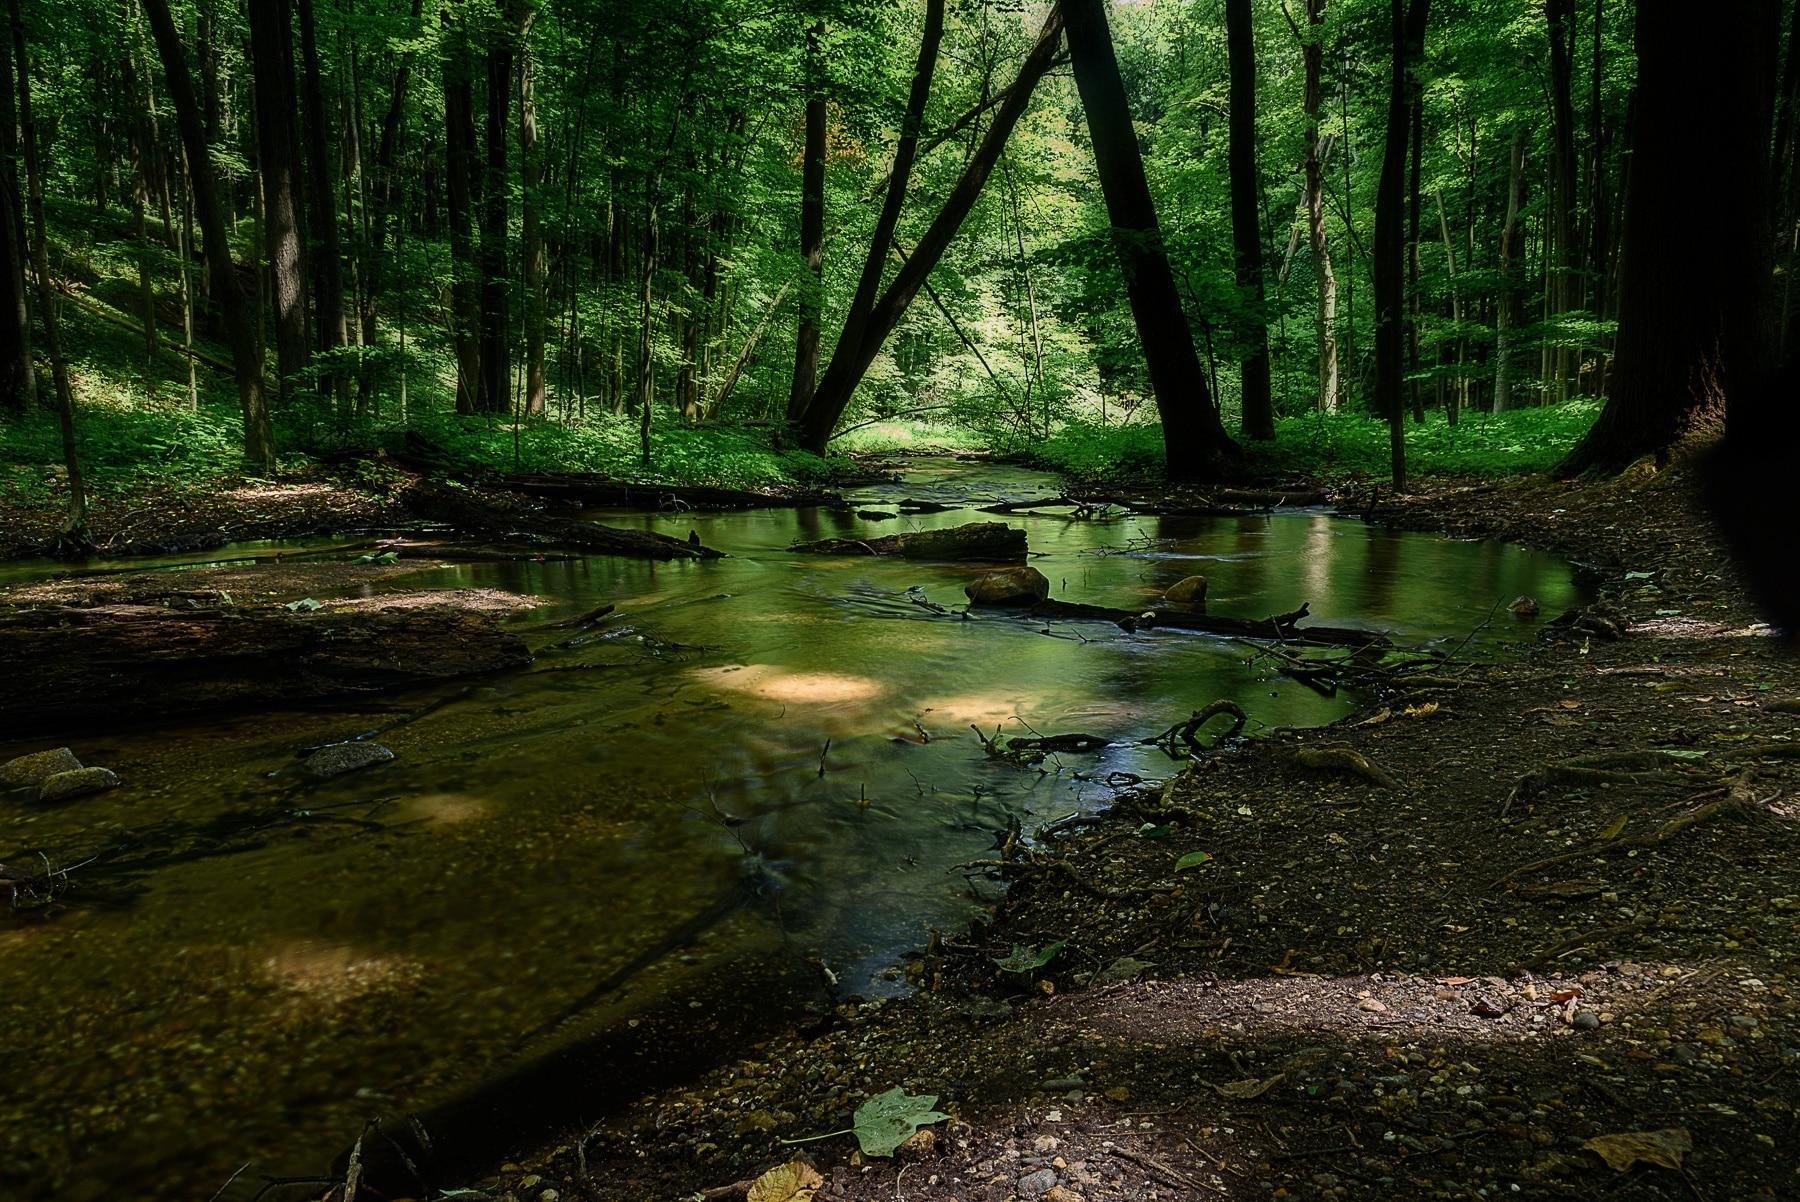 Kalamazoo Nature Center, Kalamazoo, Michigan, United States of America